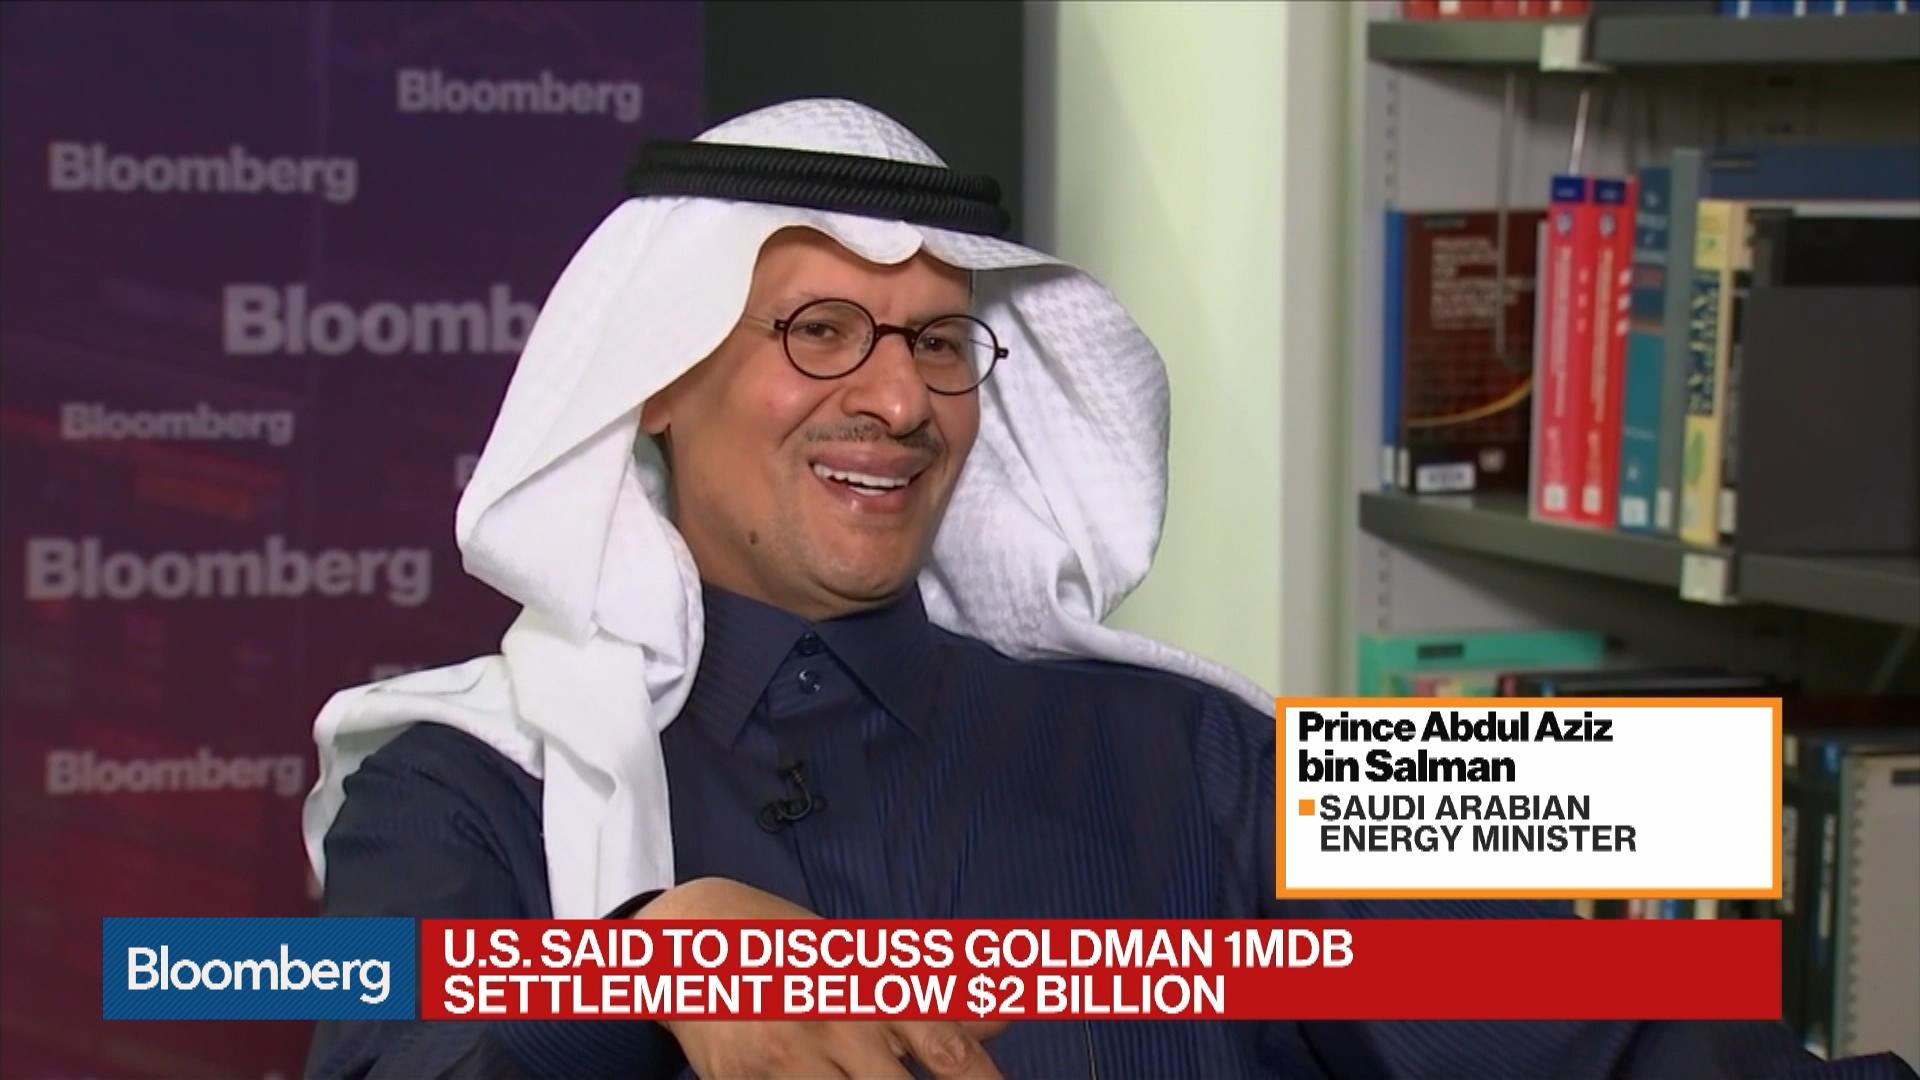 Saudi Oil Output. Aramco IPO: Prince Abdulaziz bin Salman